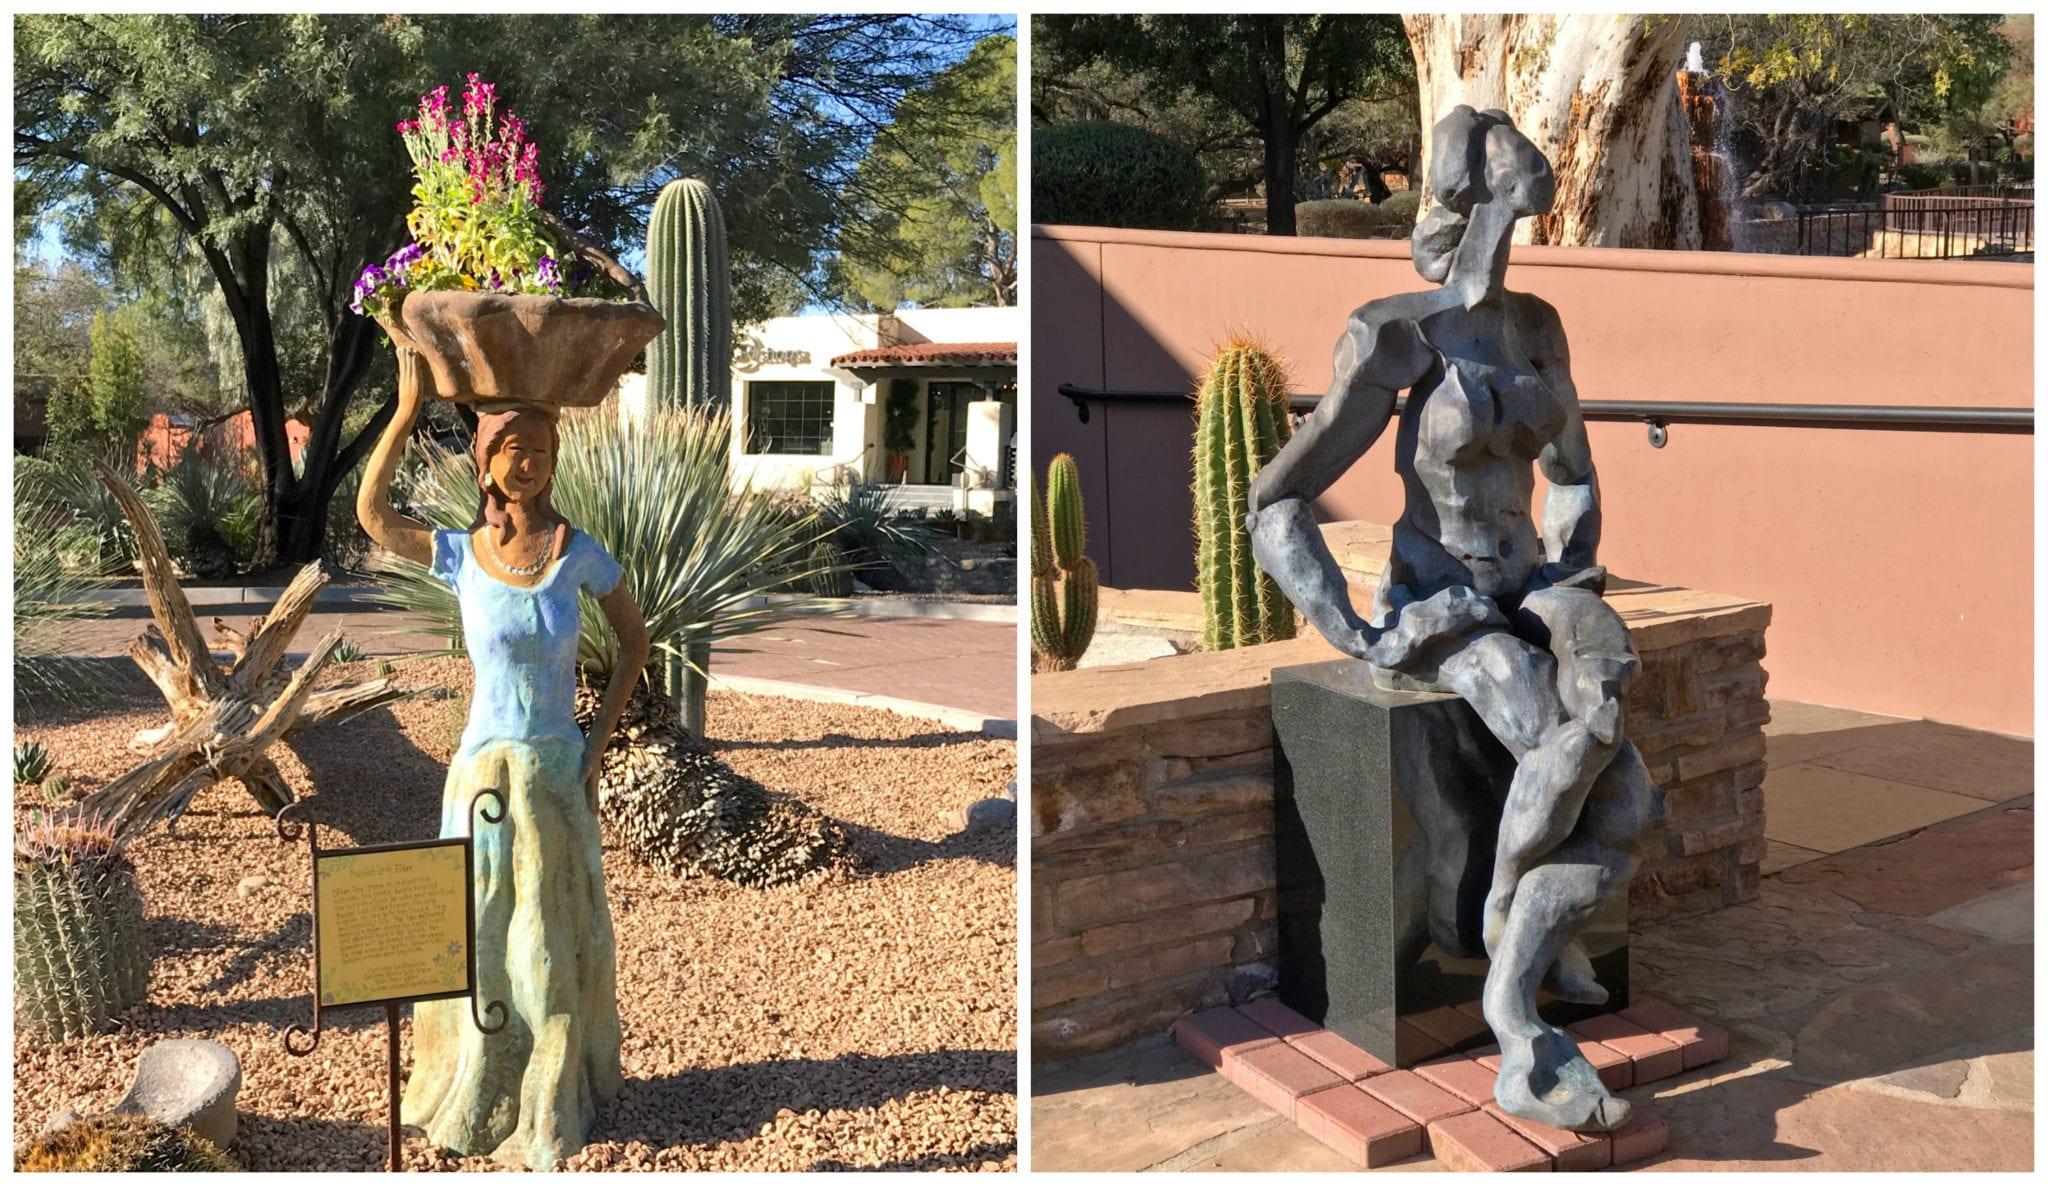 Sculptures,Spa, health retreat, wellness retreat, spa, relaxation destination, healthy vacation